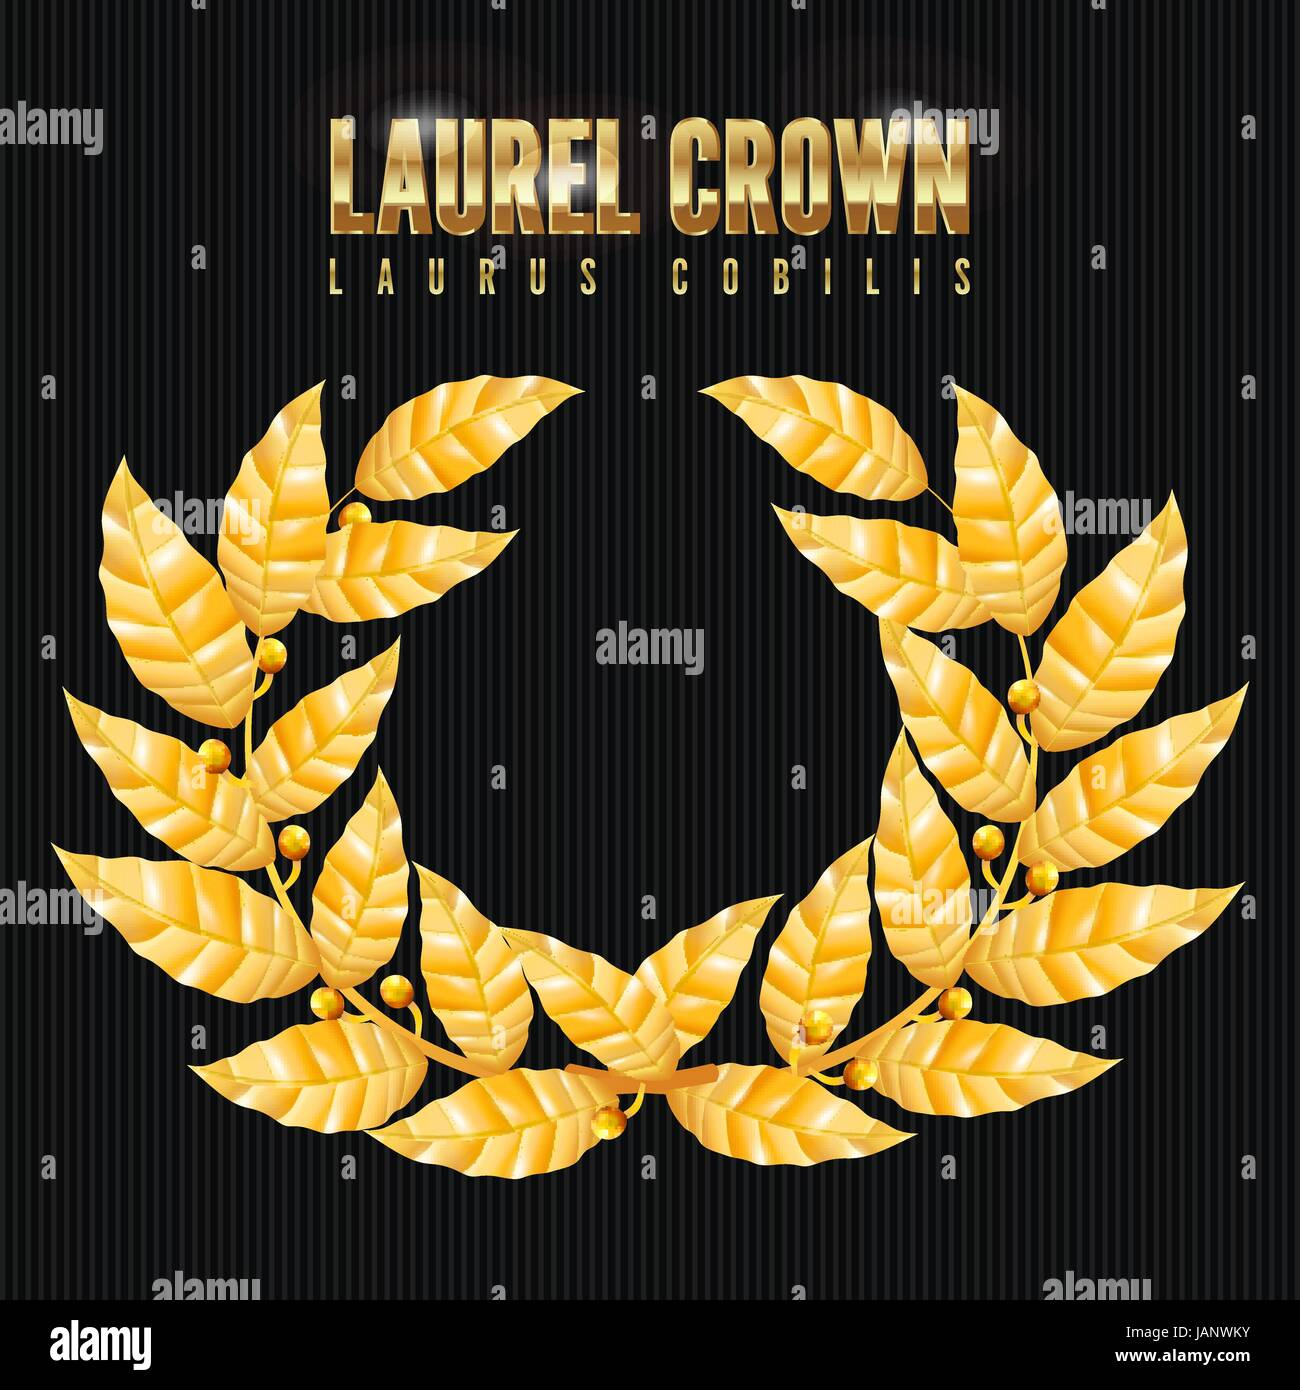 Laurel Crown. Greek Wreath With Golden Leaves. Vector Illustration. - Stock Image